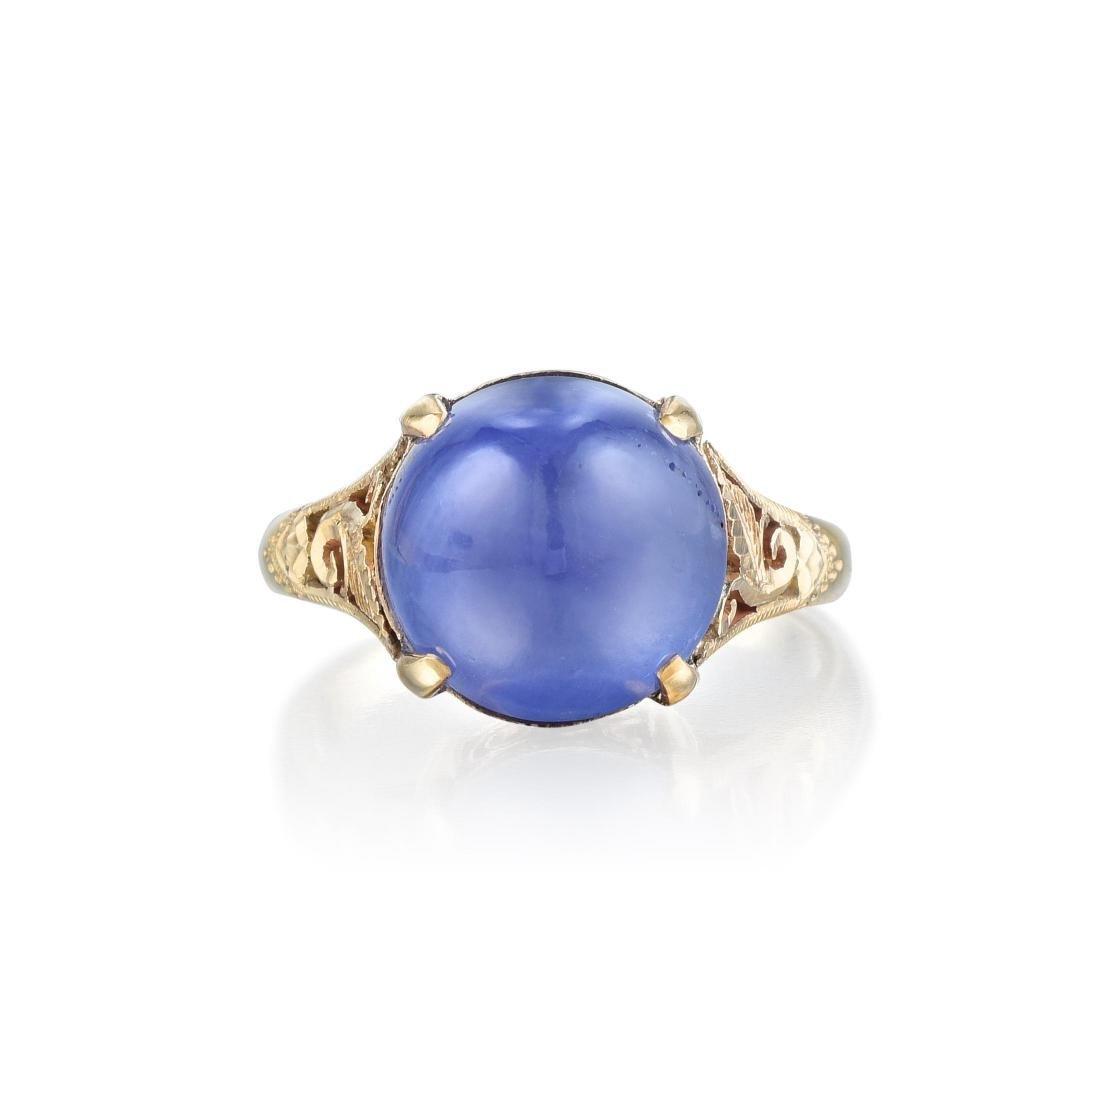 A Star Sapphire Ring